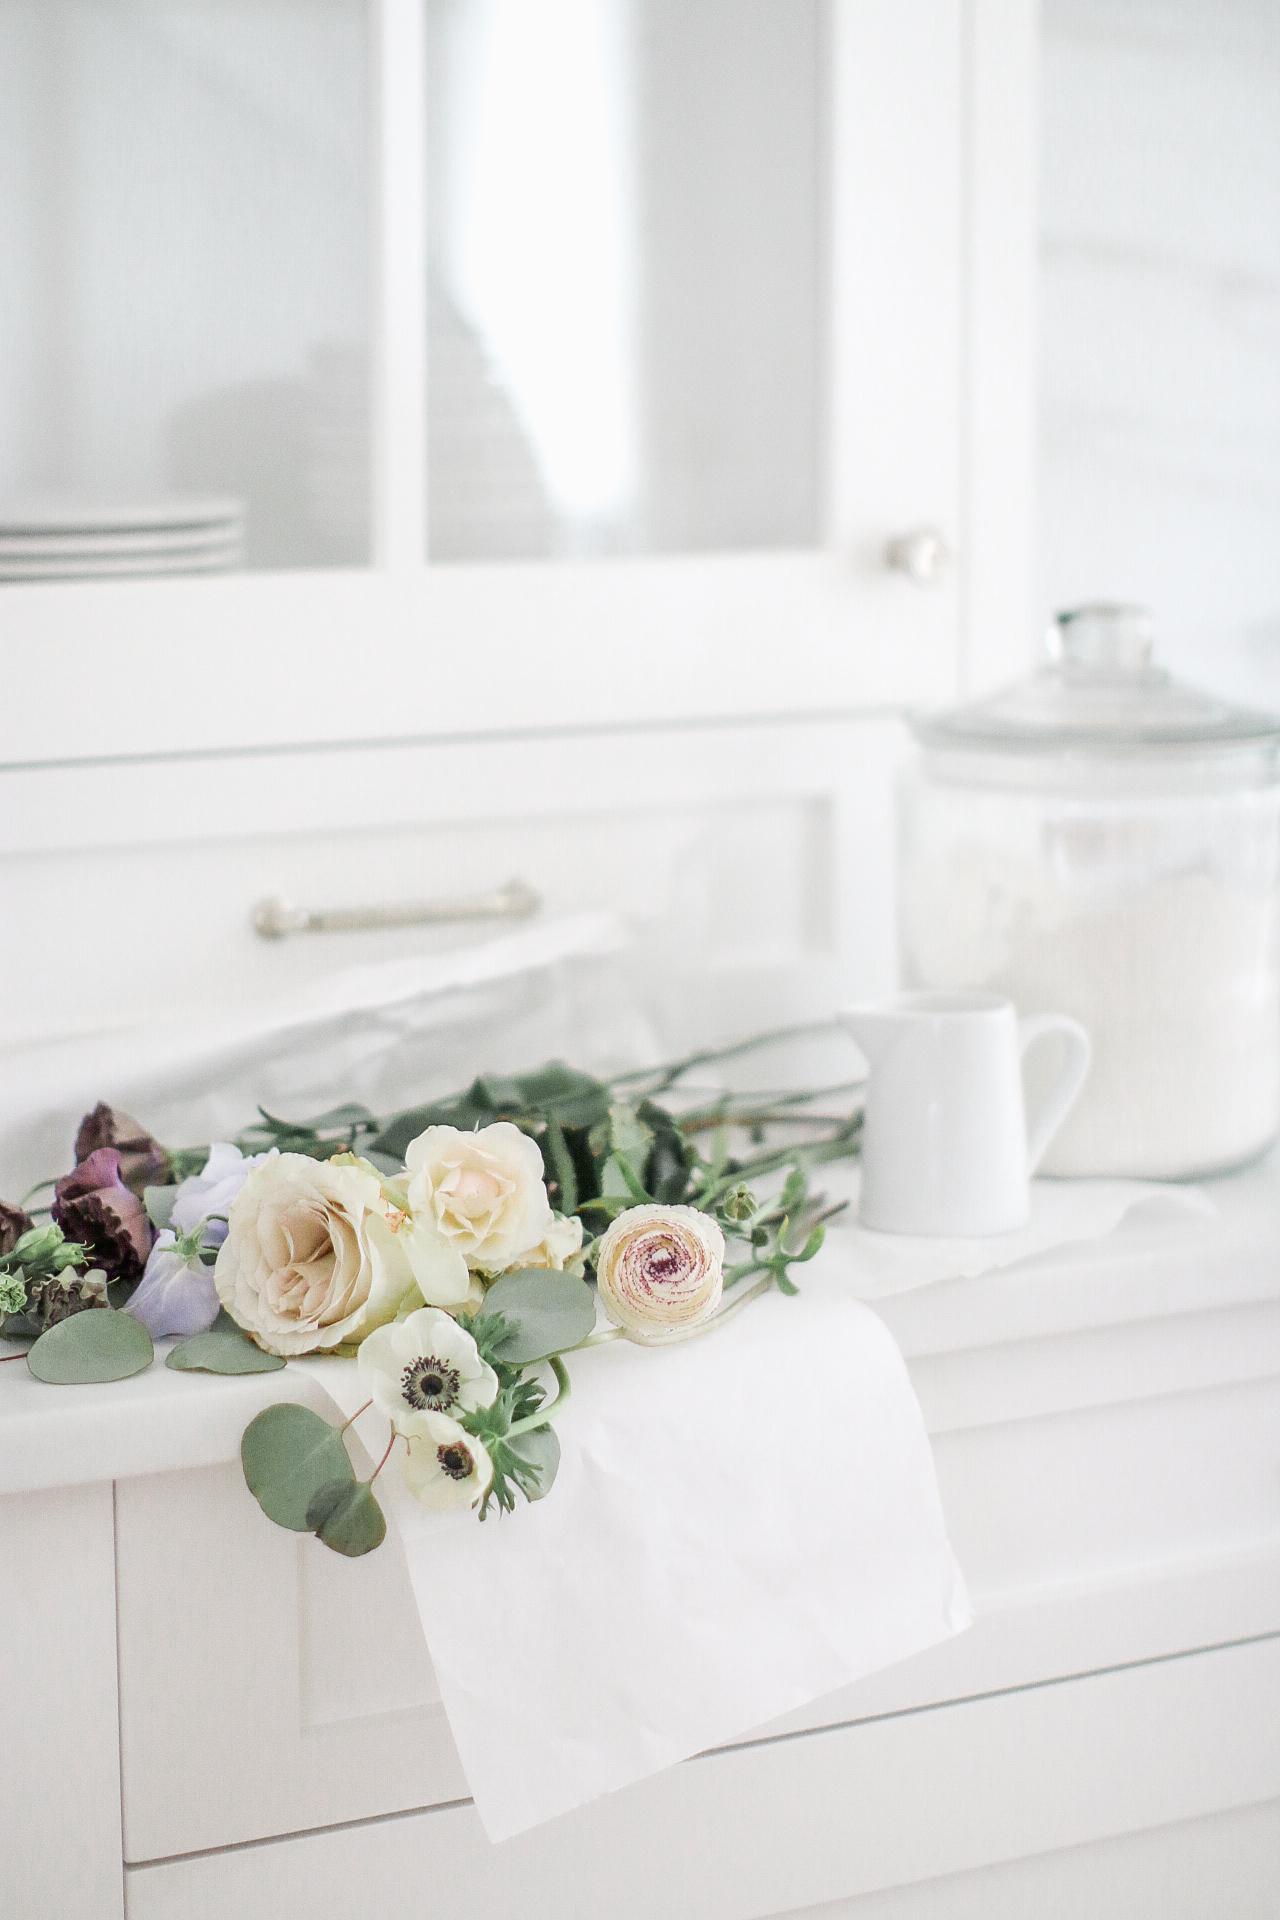 Florals Country White Kitchen Monika Hibbs